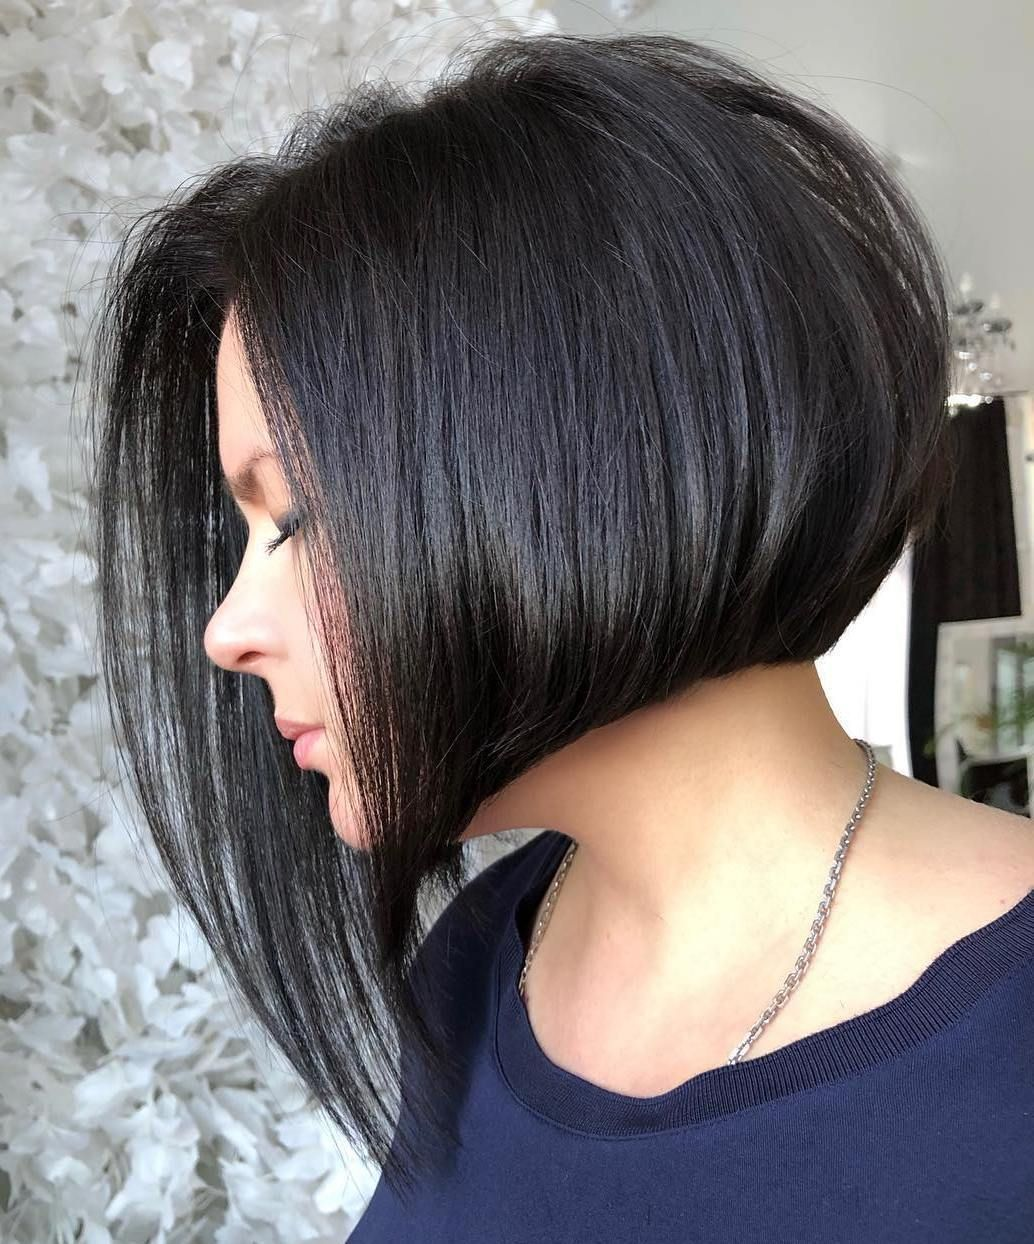 55 Bob Haircuts And Hairstyles Ideas 2020 Frisuren Kinnlang Feines Haar Mit Pony 55 Bob H In 2020 Bob Frisur Bob Frisur Hinten Kurz Vorne Lang Bob Frisuren Mittellang